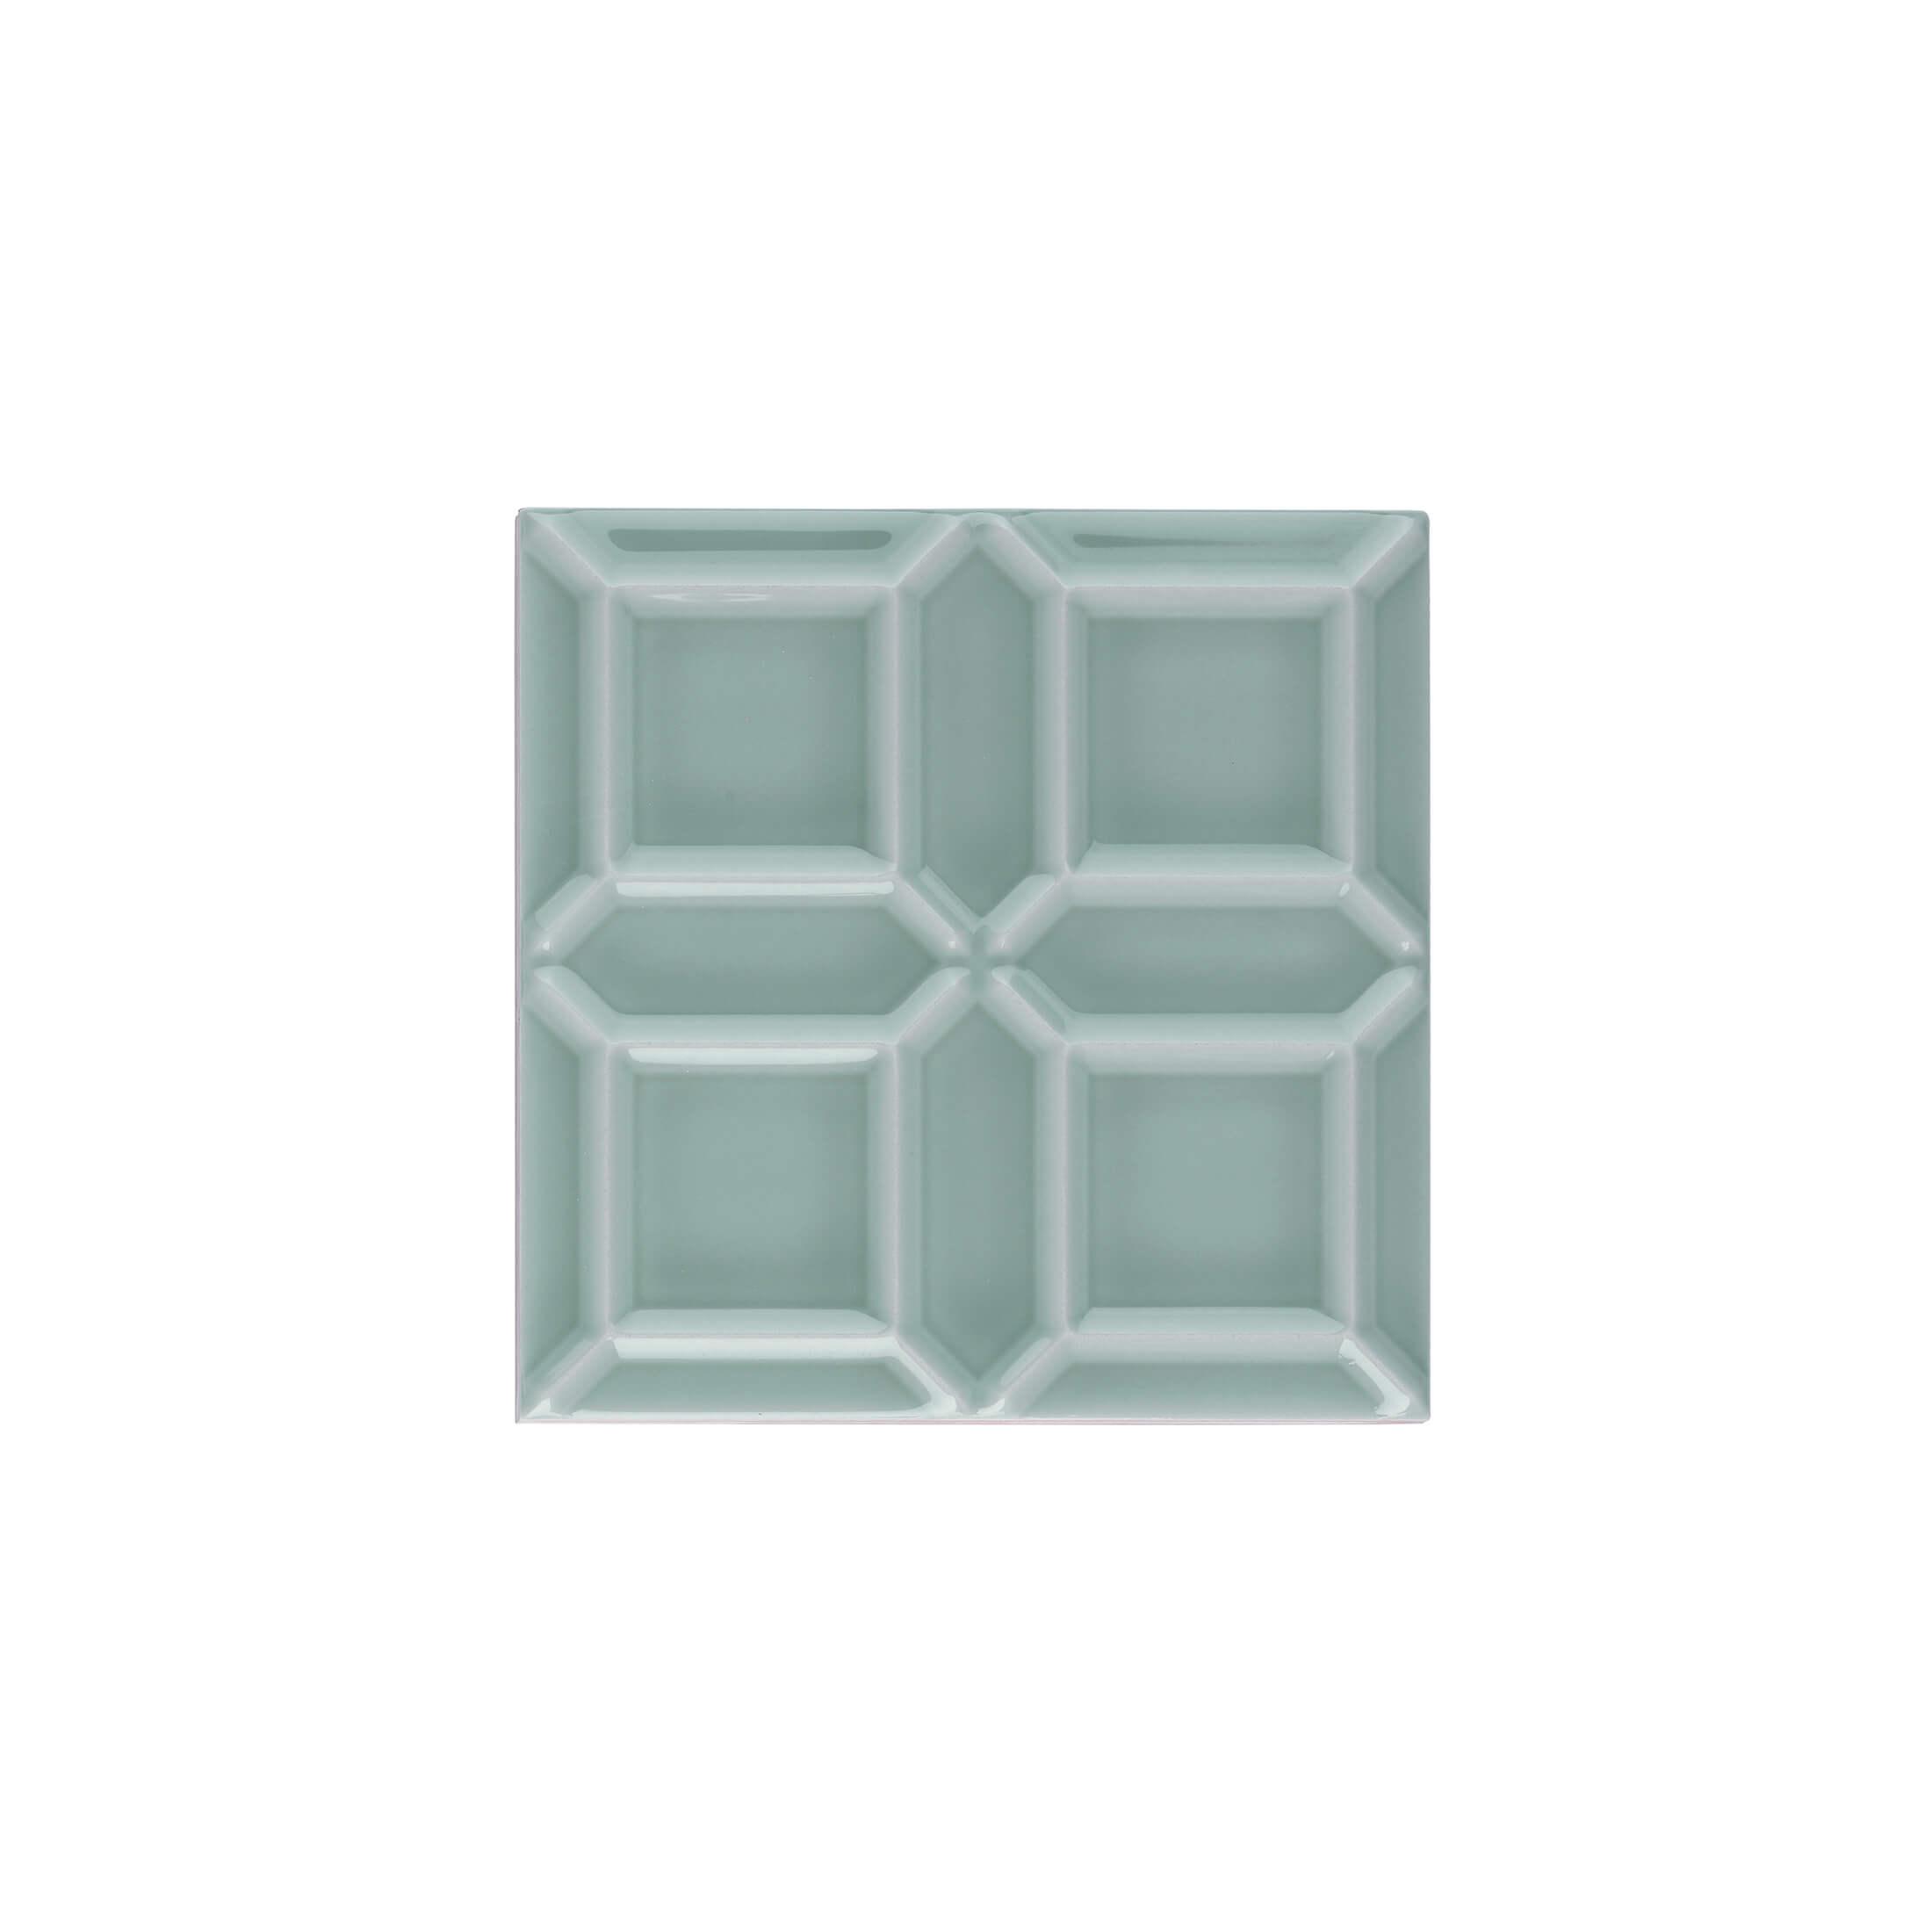 ADNE1114 - LISO EDGE - 15 cm X 15 cm